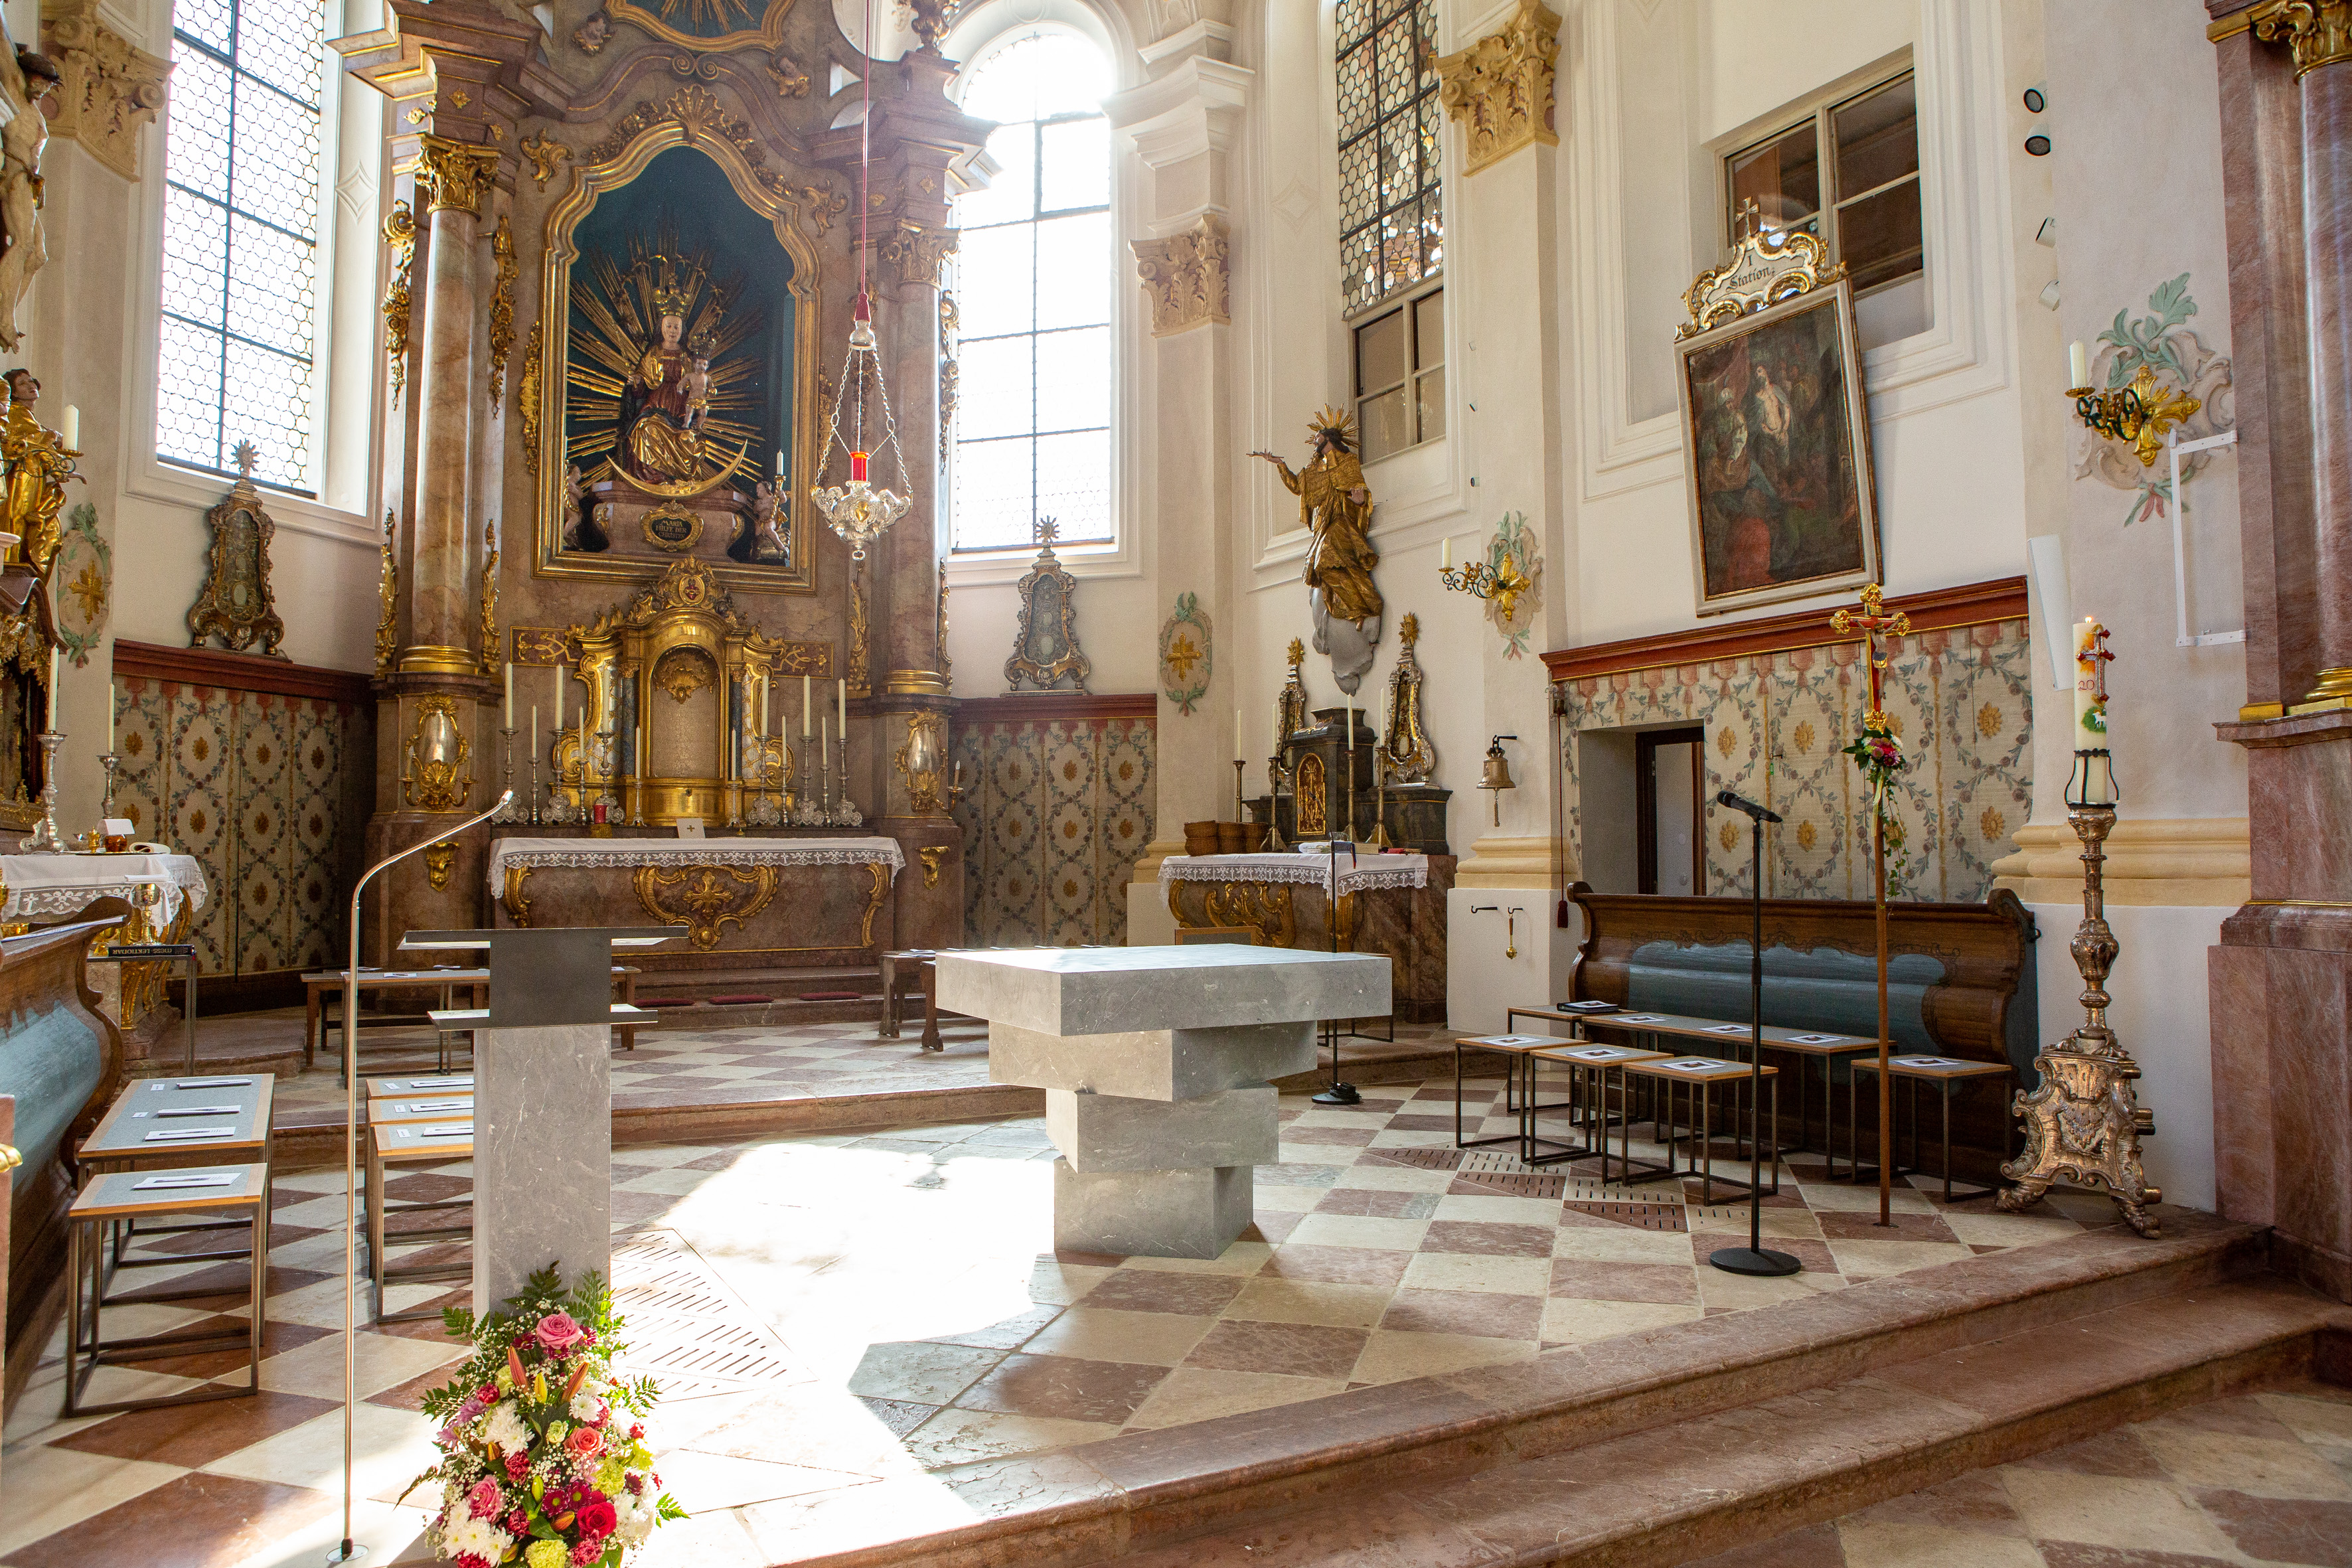 Pfarrkirche Mariä Himmelfahrt Bad Aibling Altar